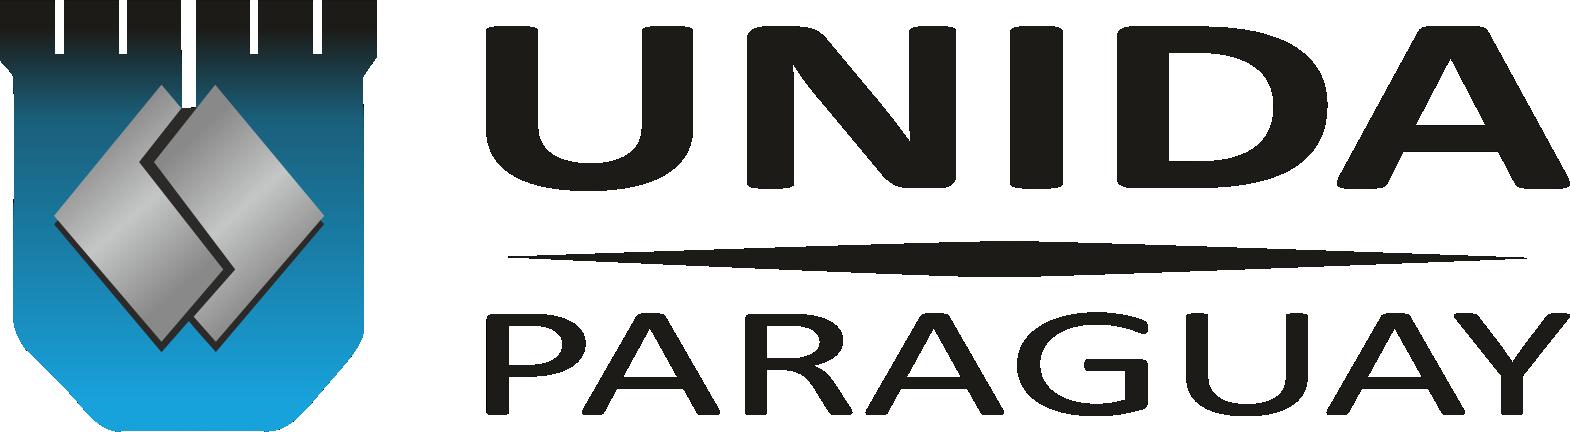 UNIDA logo